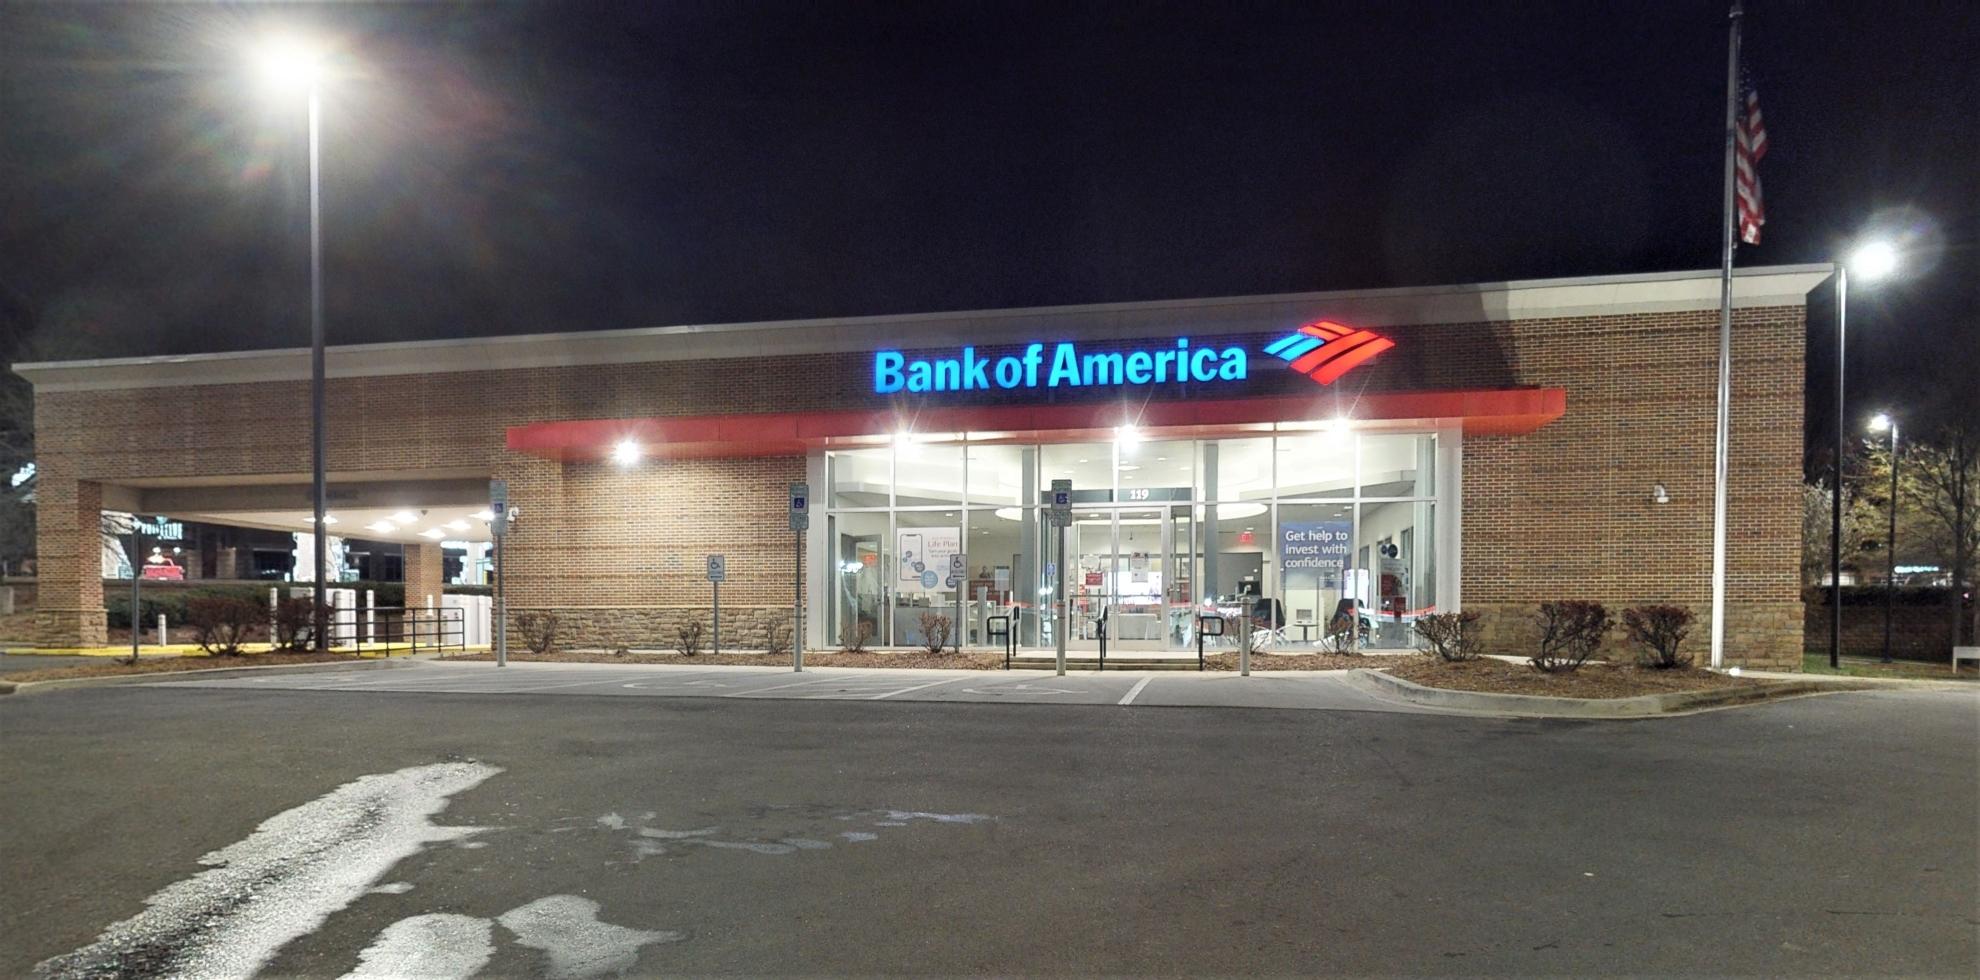 Bank of America financial center with drive-thru ATM | 119 Cross Center Rd, Denver, NC 28037